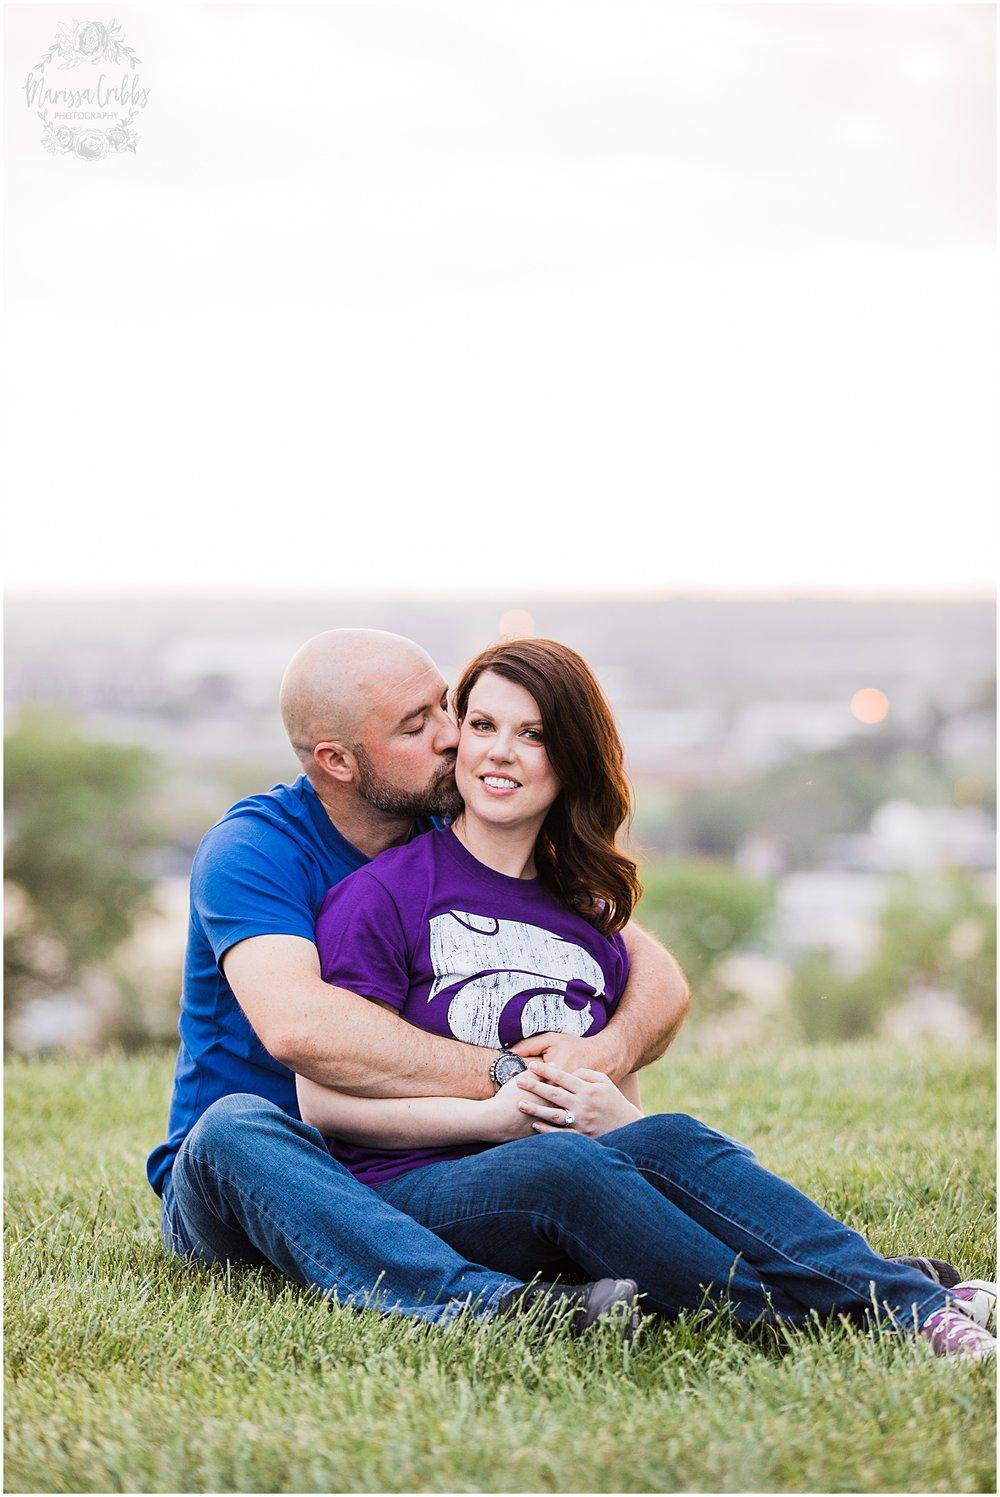 LAURA & DANIEL ENGAGEMENT | MARISSA CRIBBS PHOTOGRAPHY | LIBERTY MEMORIAL_4981.jpg